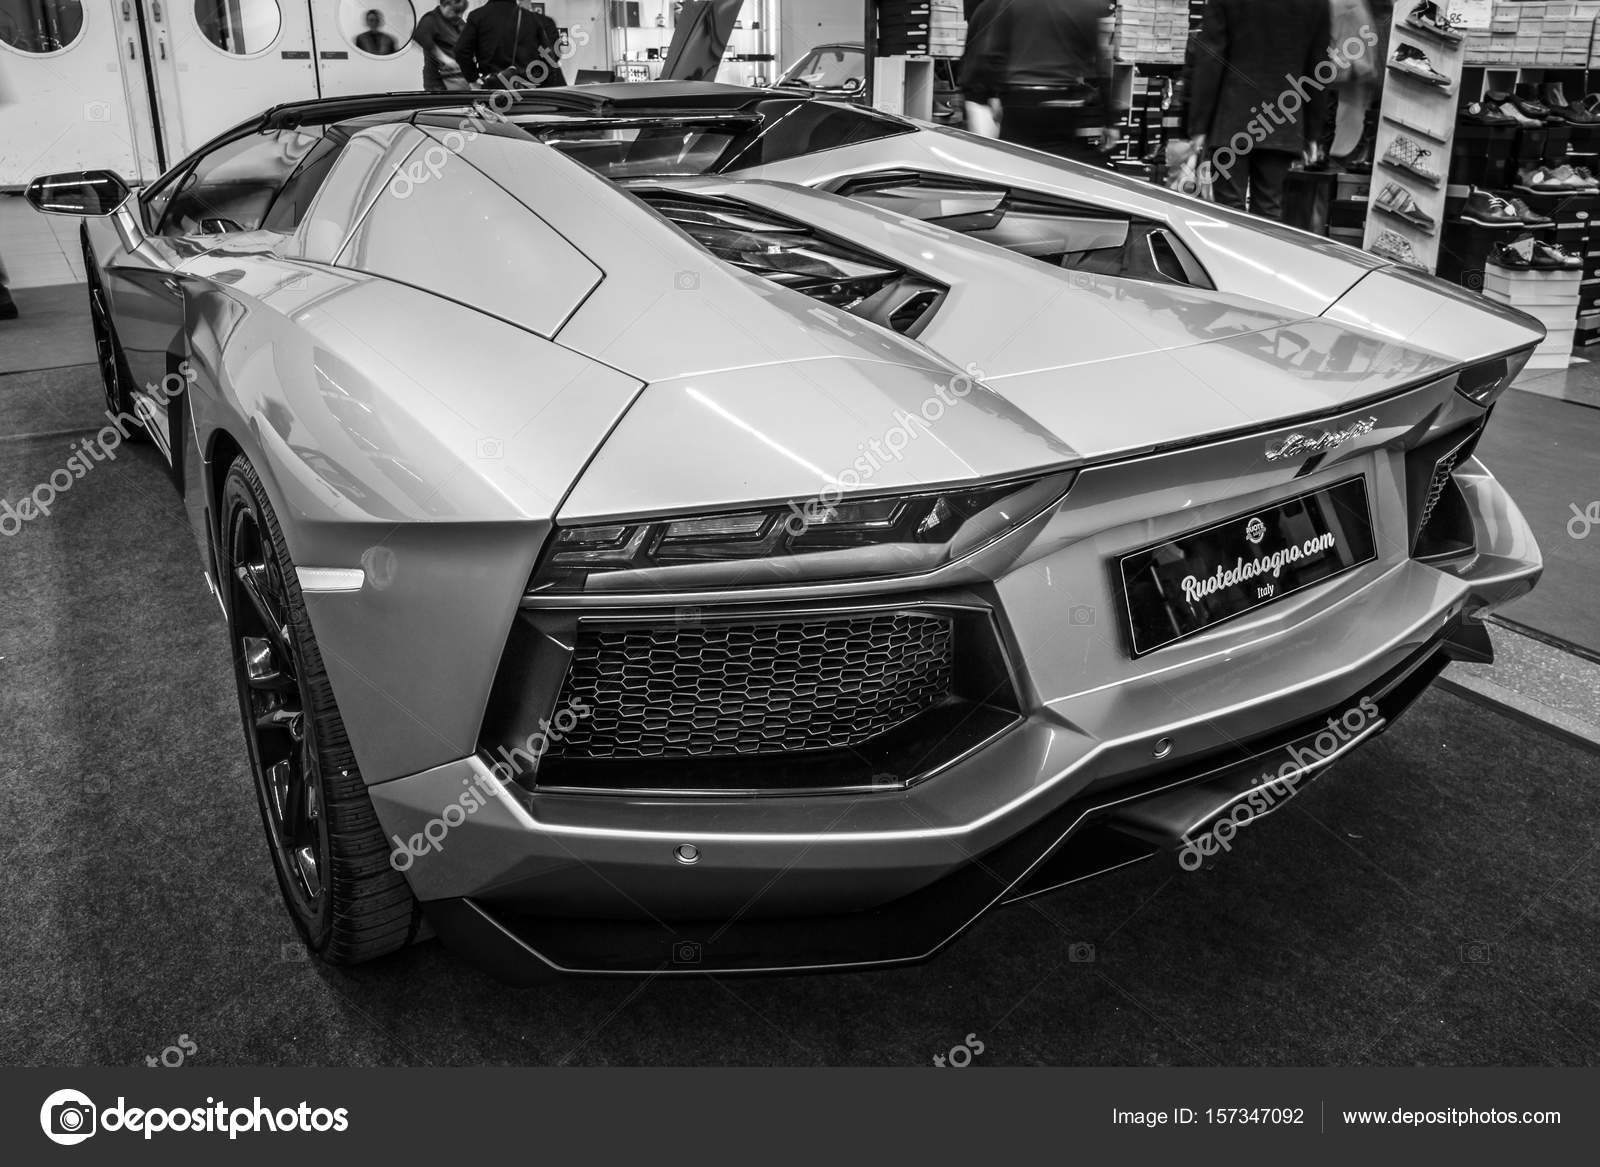 Sportbil Lamborghini Aventador Lp 700 4 2014 Redaktionell